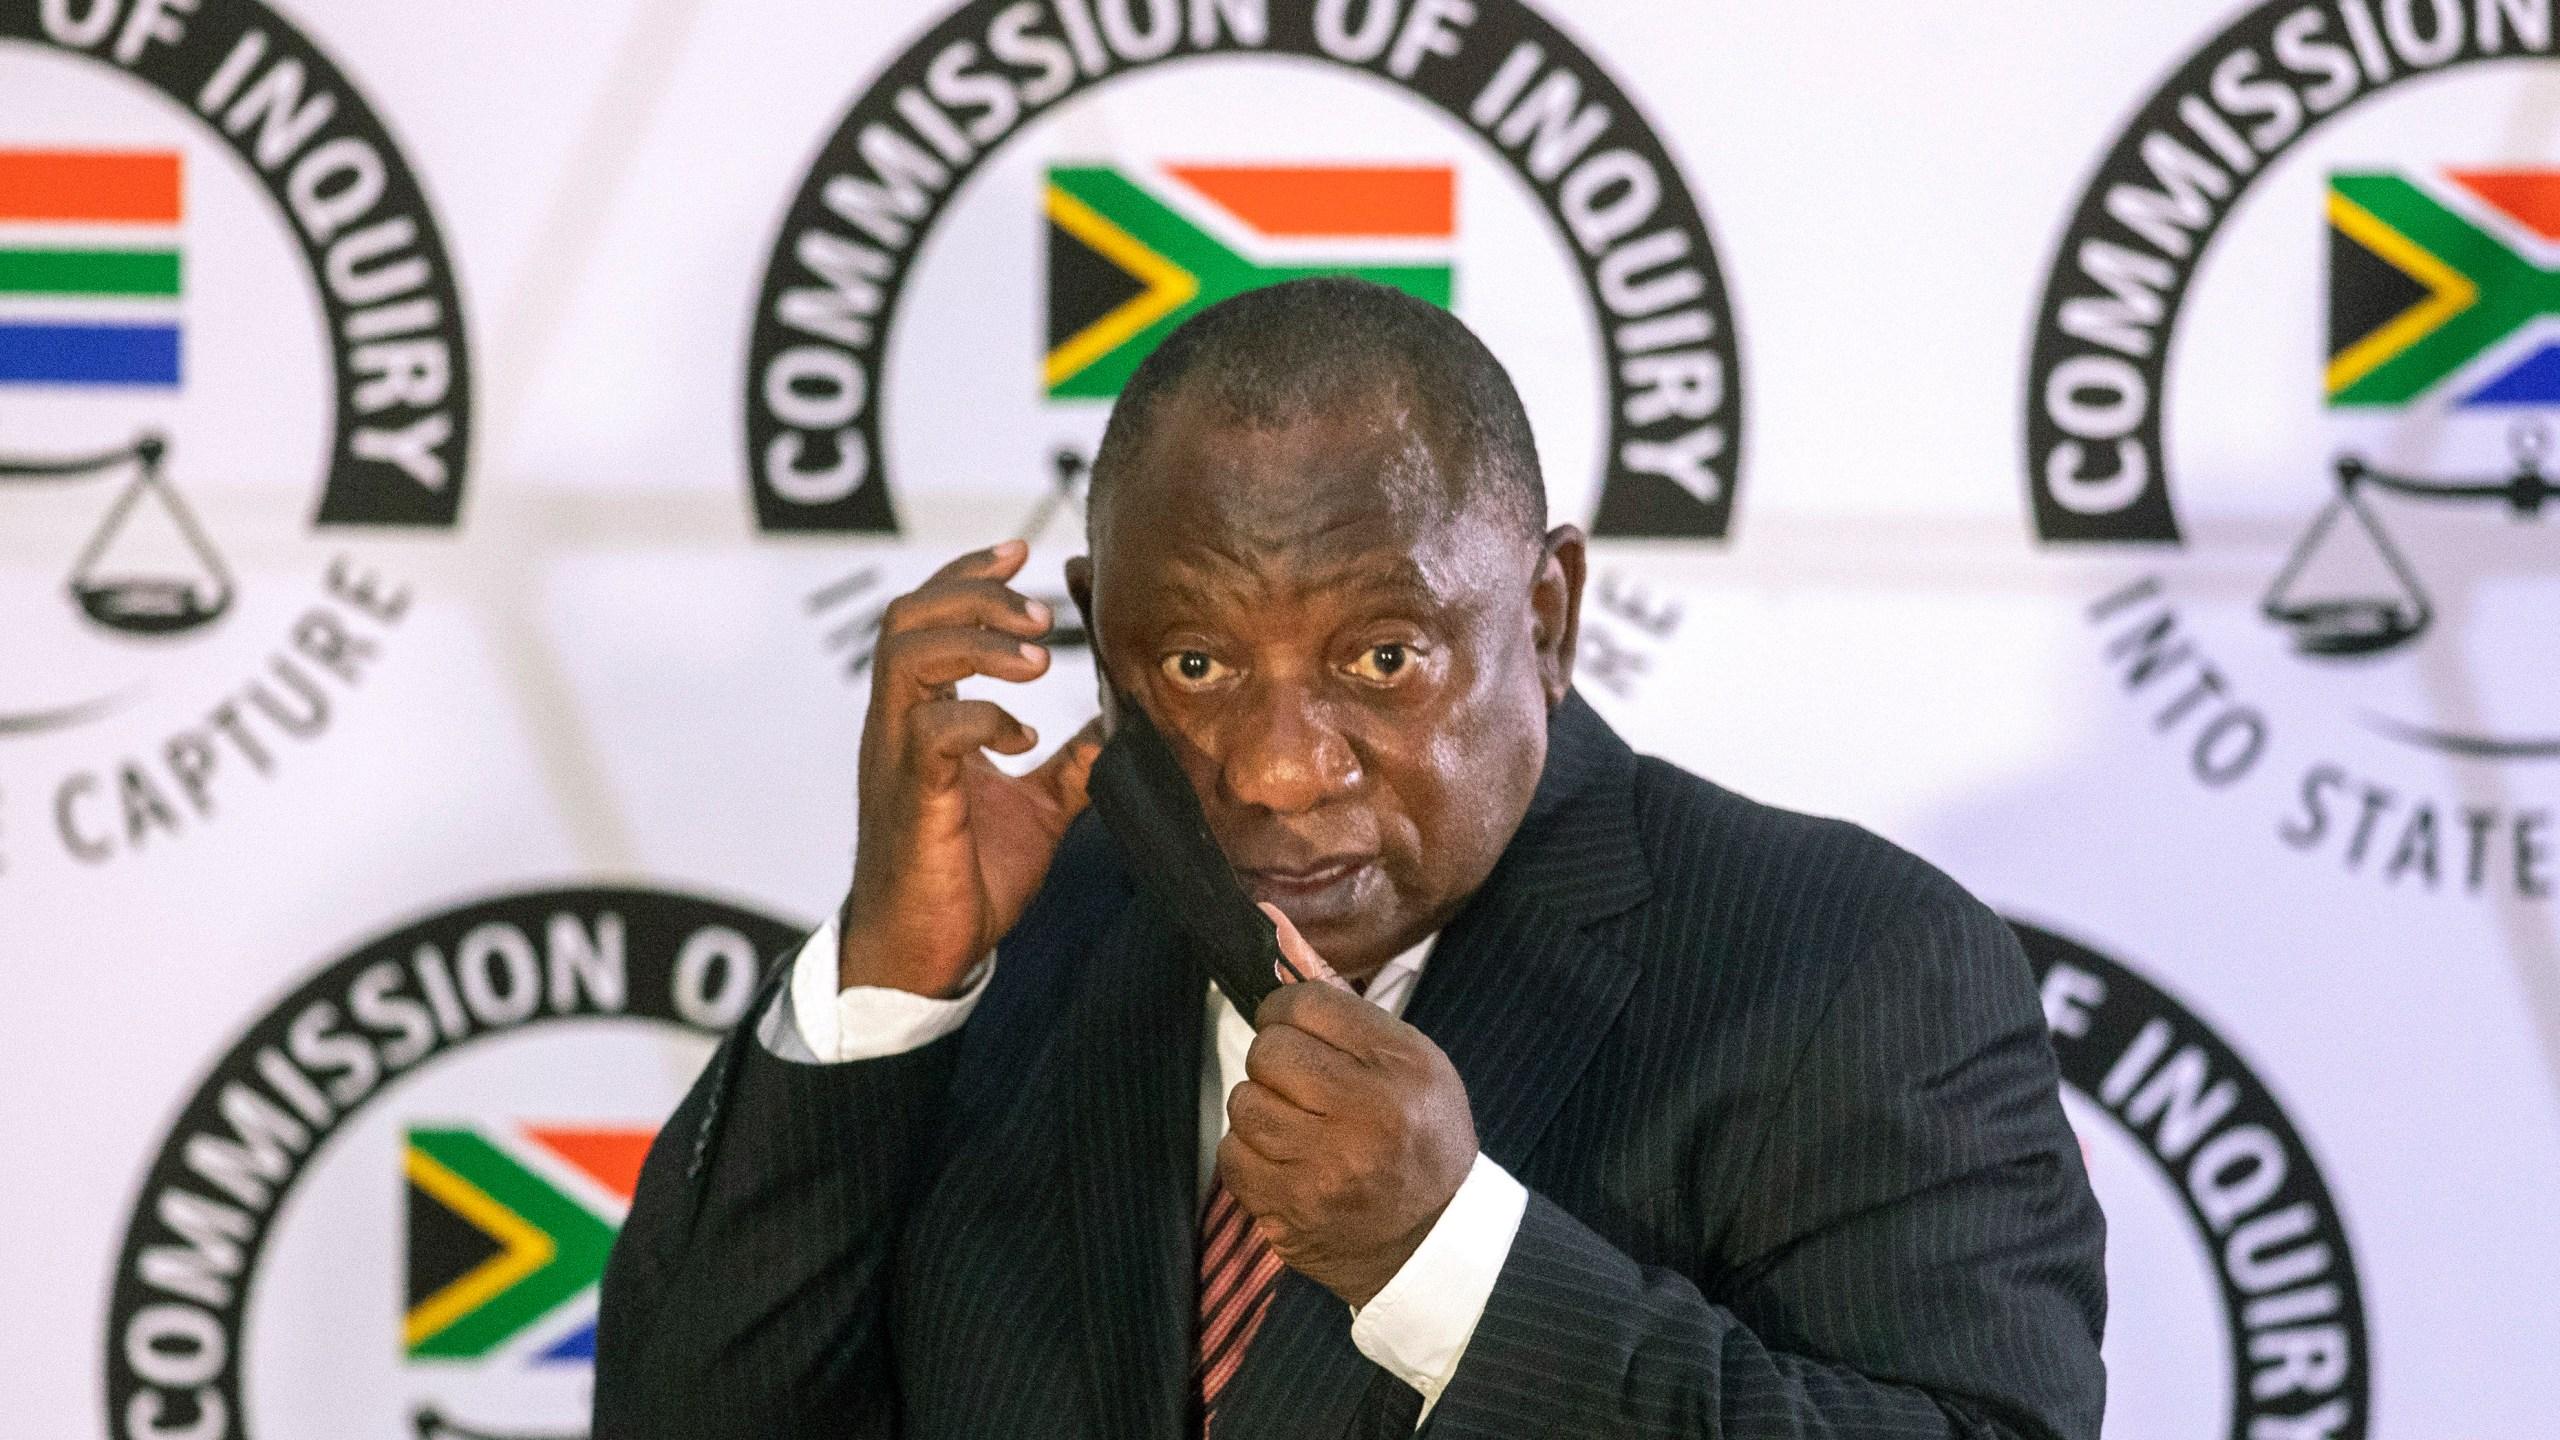 Cyril Ramaphosa, Tshepo Motsepe